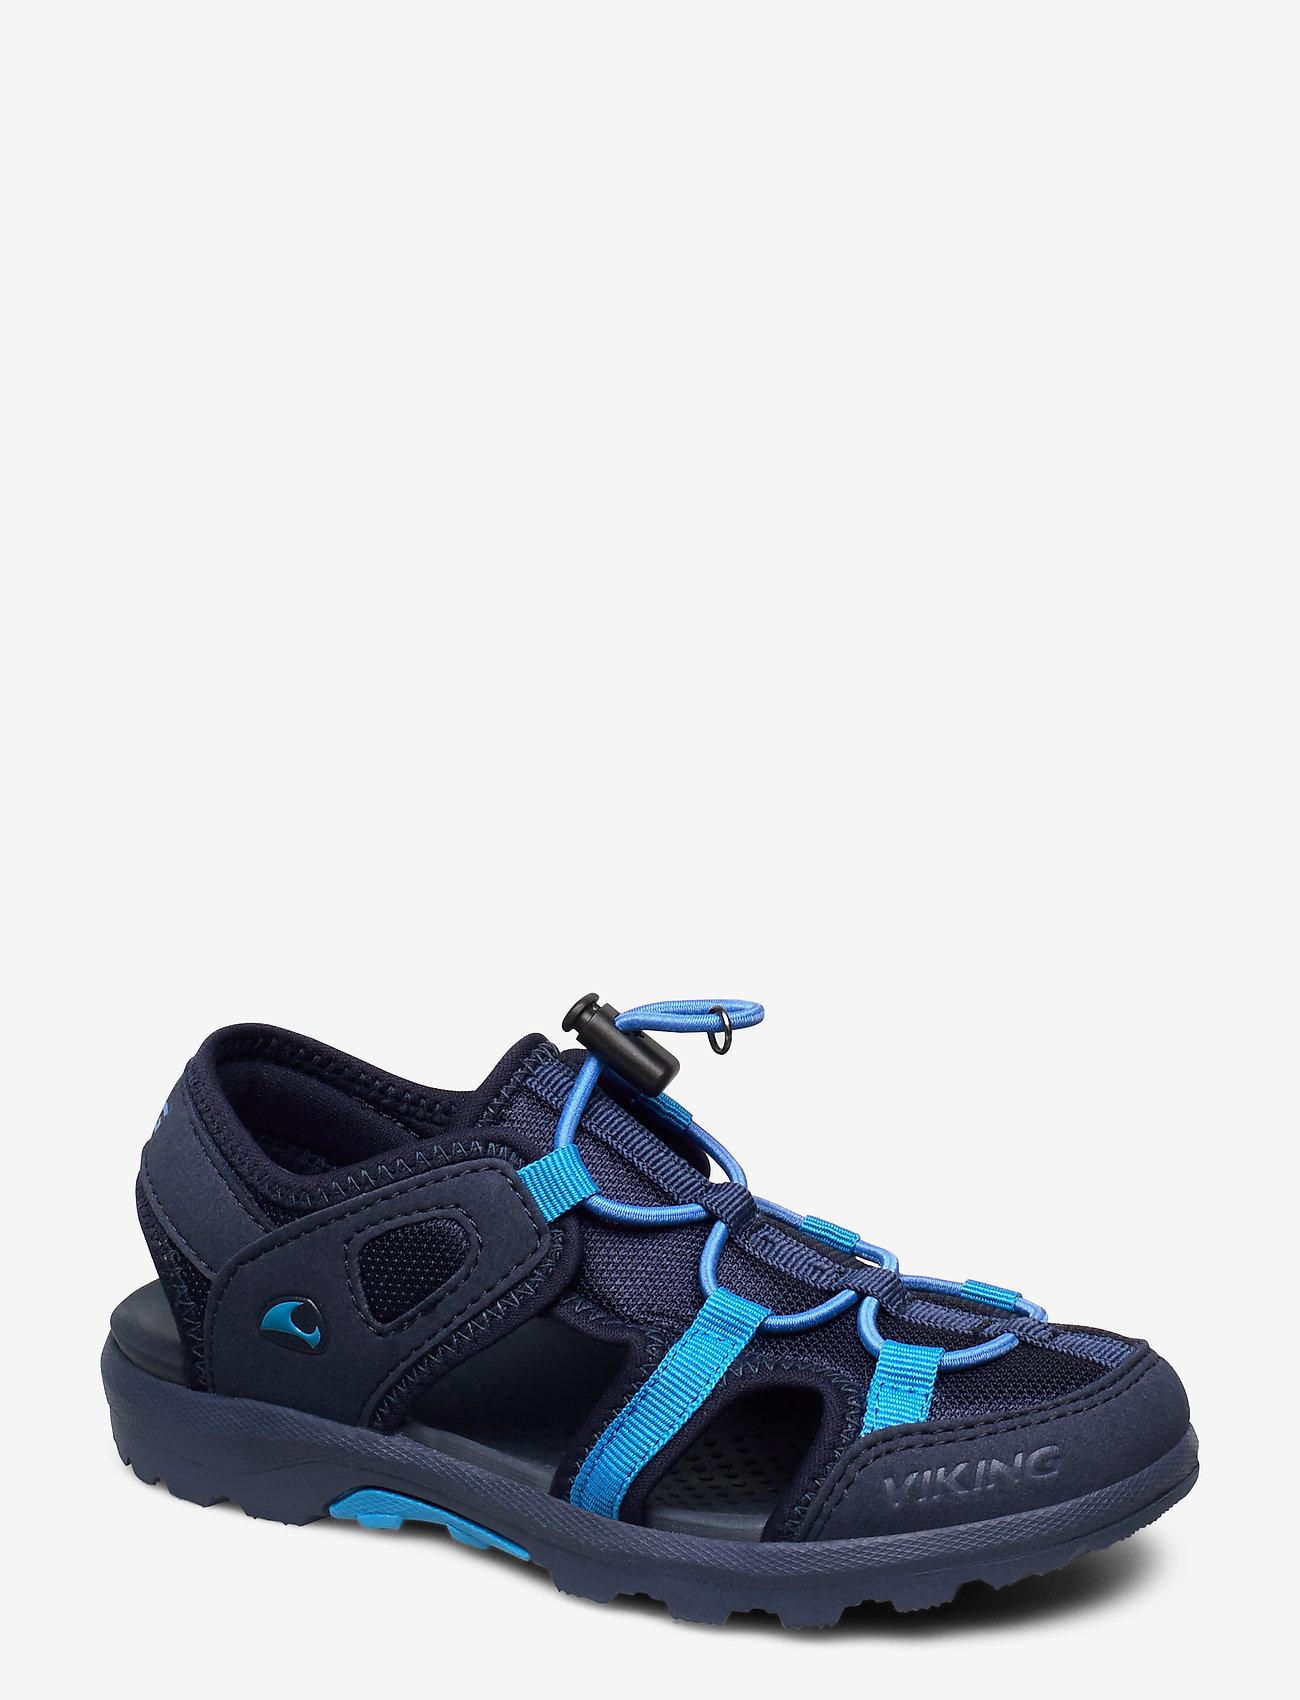 Viking - Sandvika - sandals - navy/blue - 0